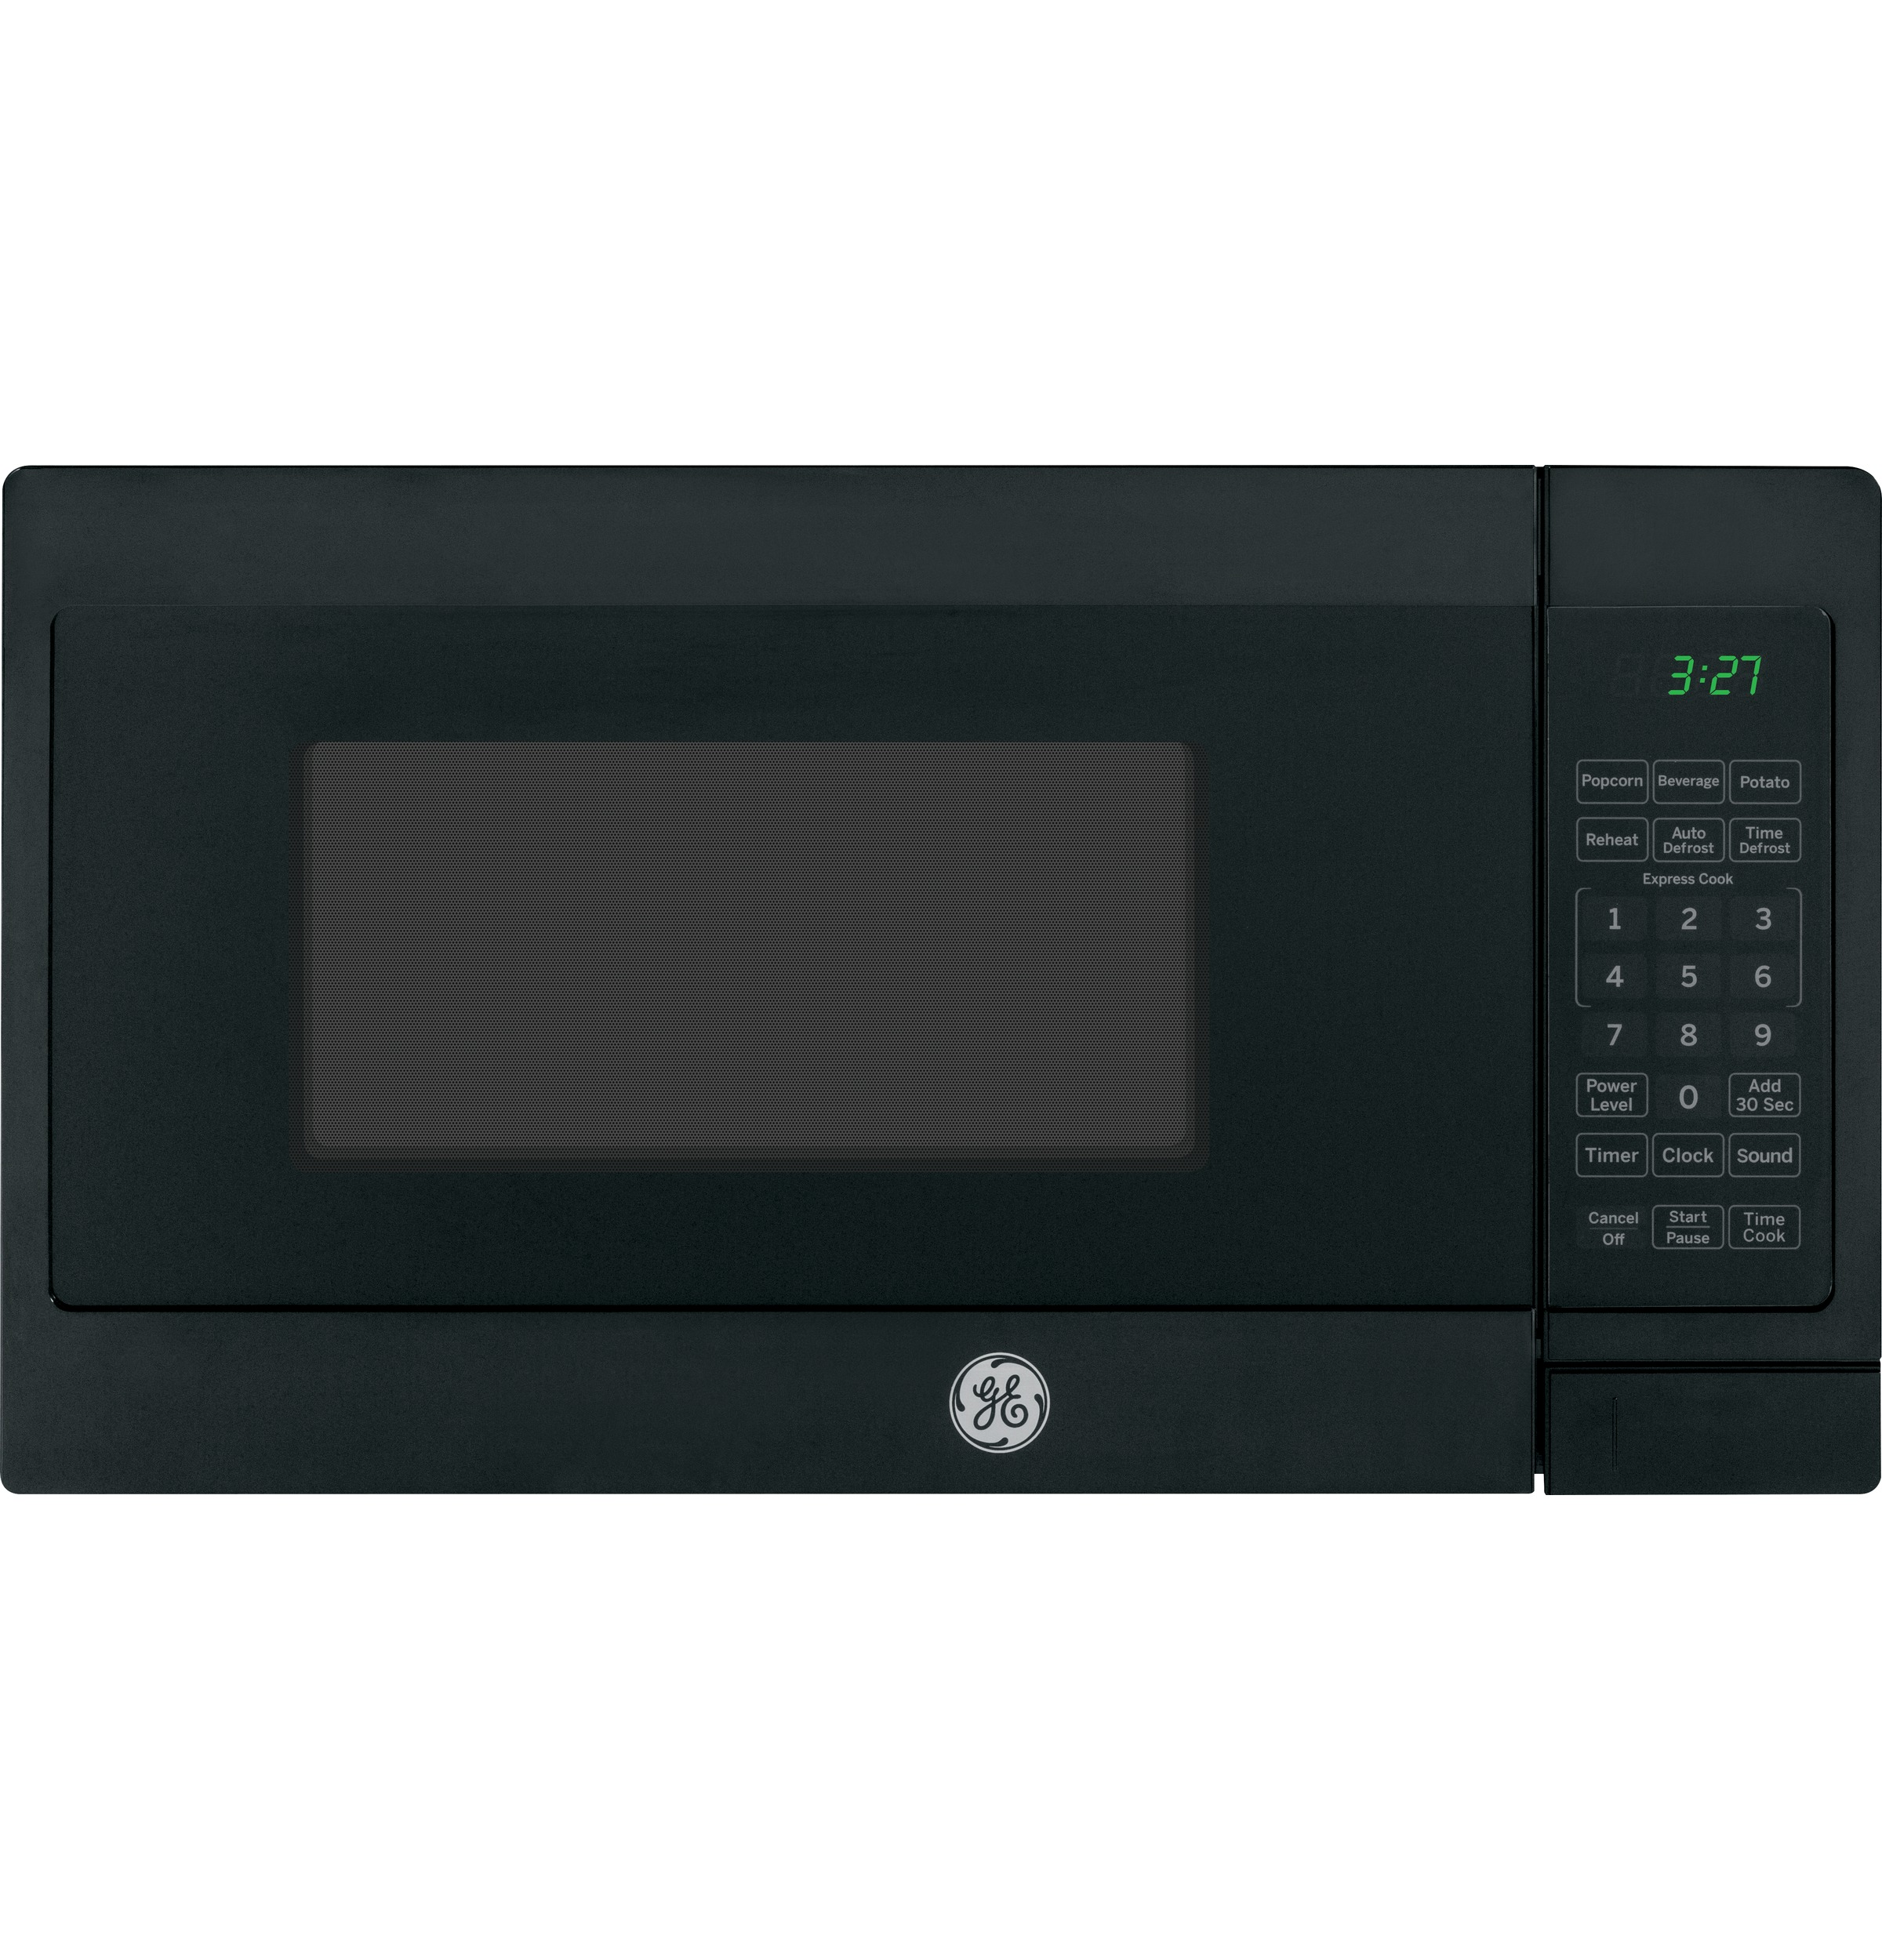 GE GE® 0.7 Cu. Ft. Capacity Countertop Microwave Oven